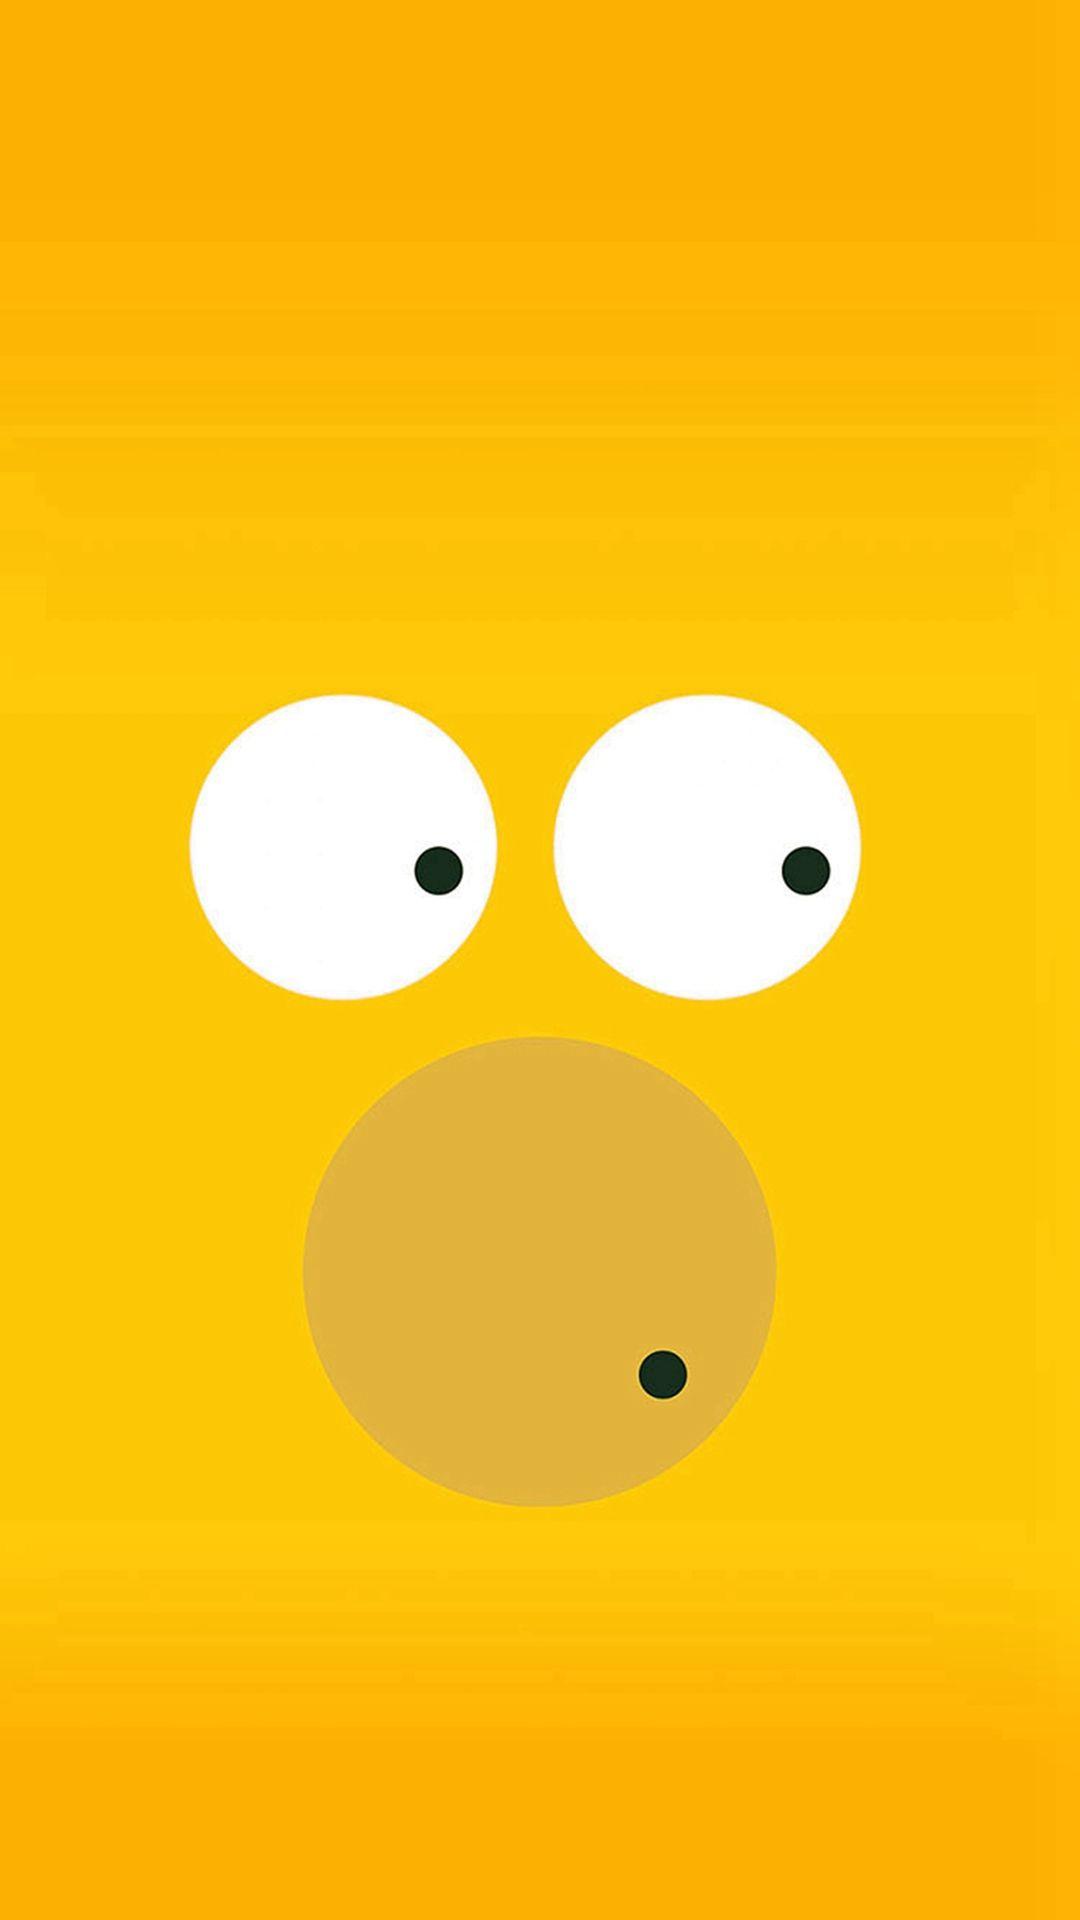 Funny Homer Simpson Minimal Illustration iPhone 6 wallpaper